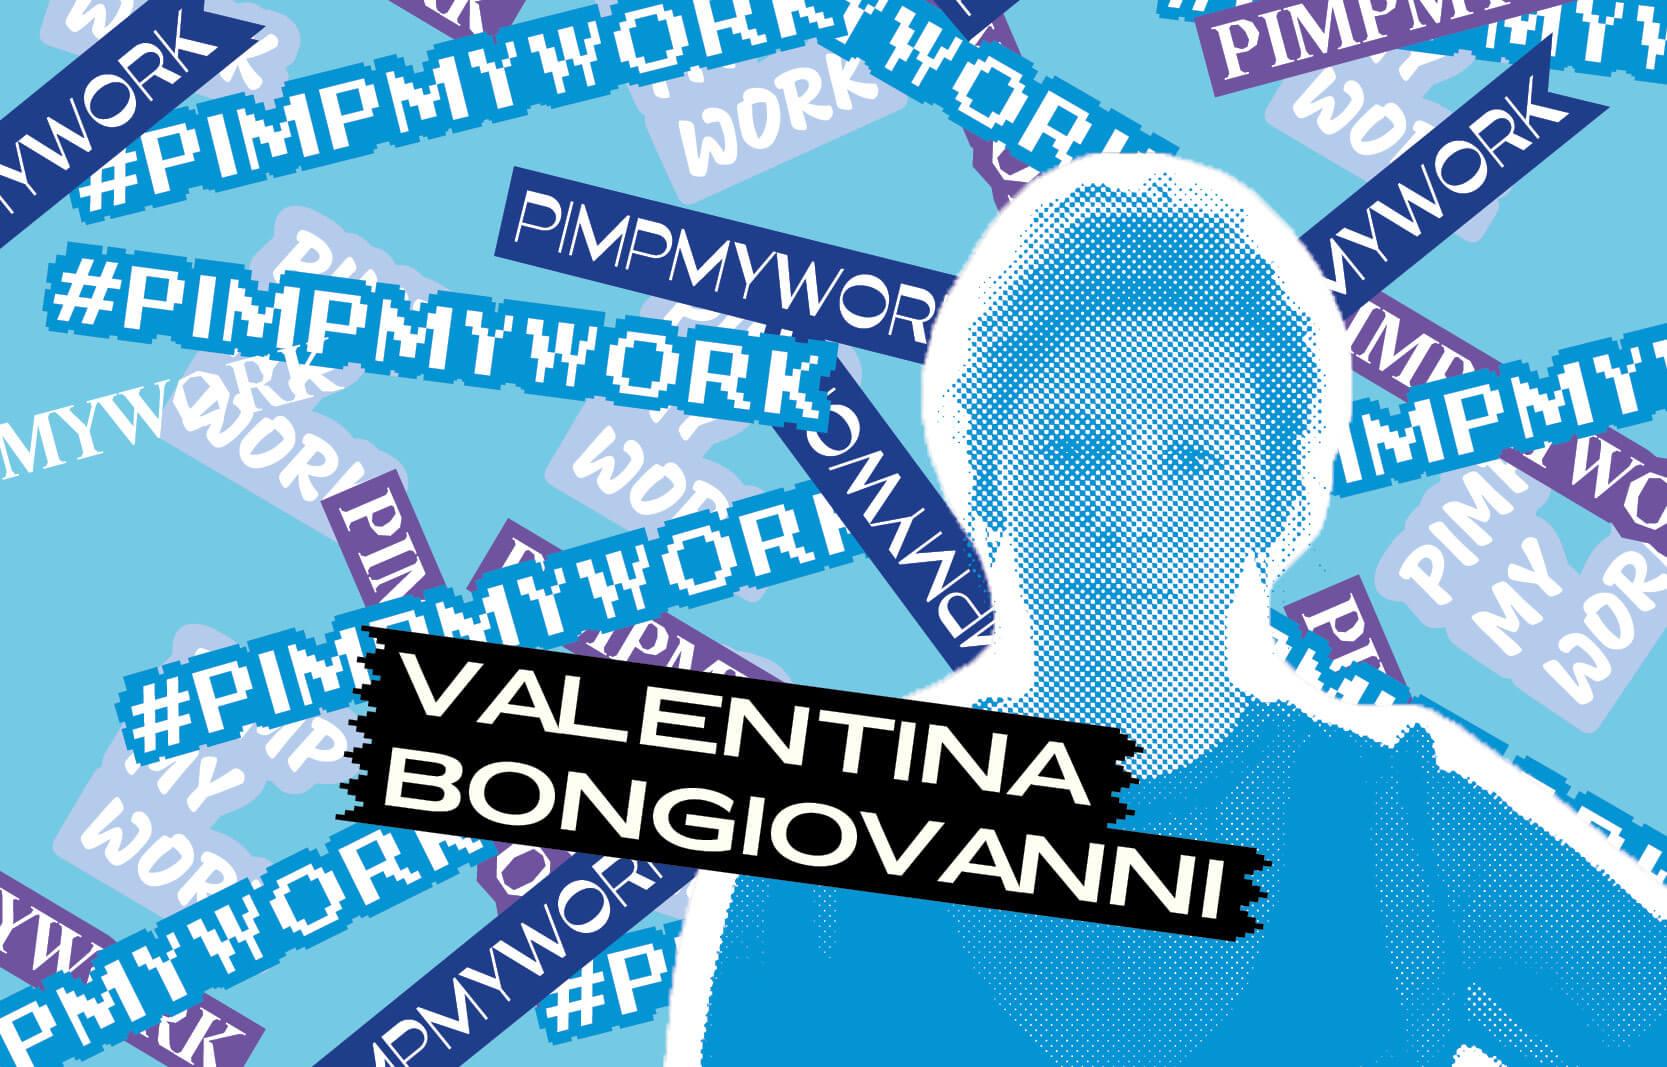 Valentina Bongiovanni